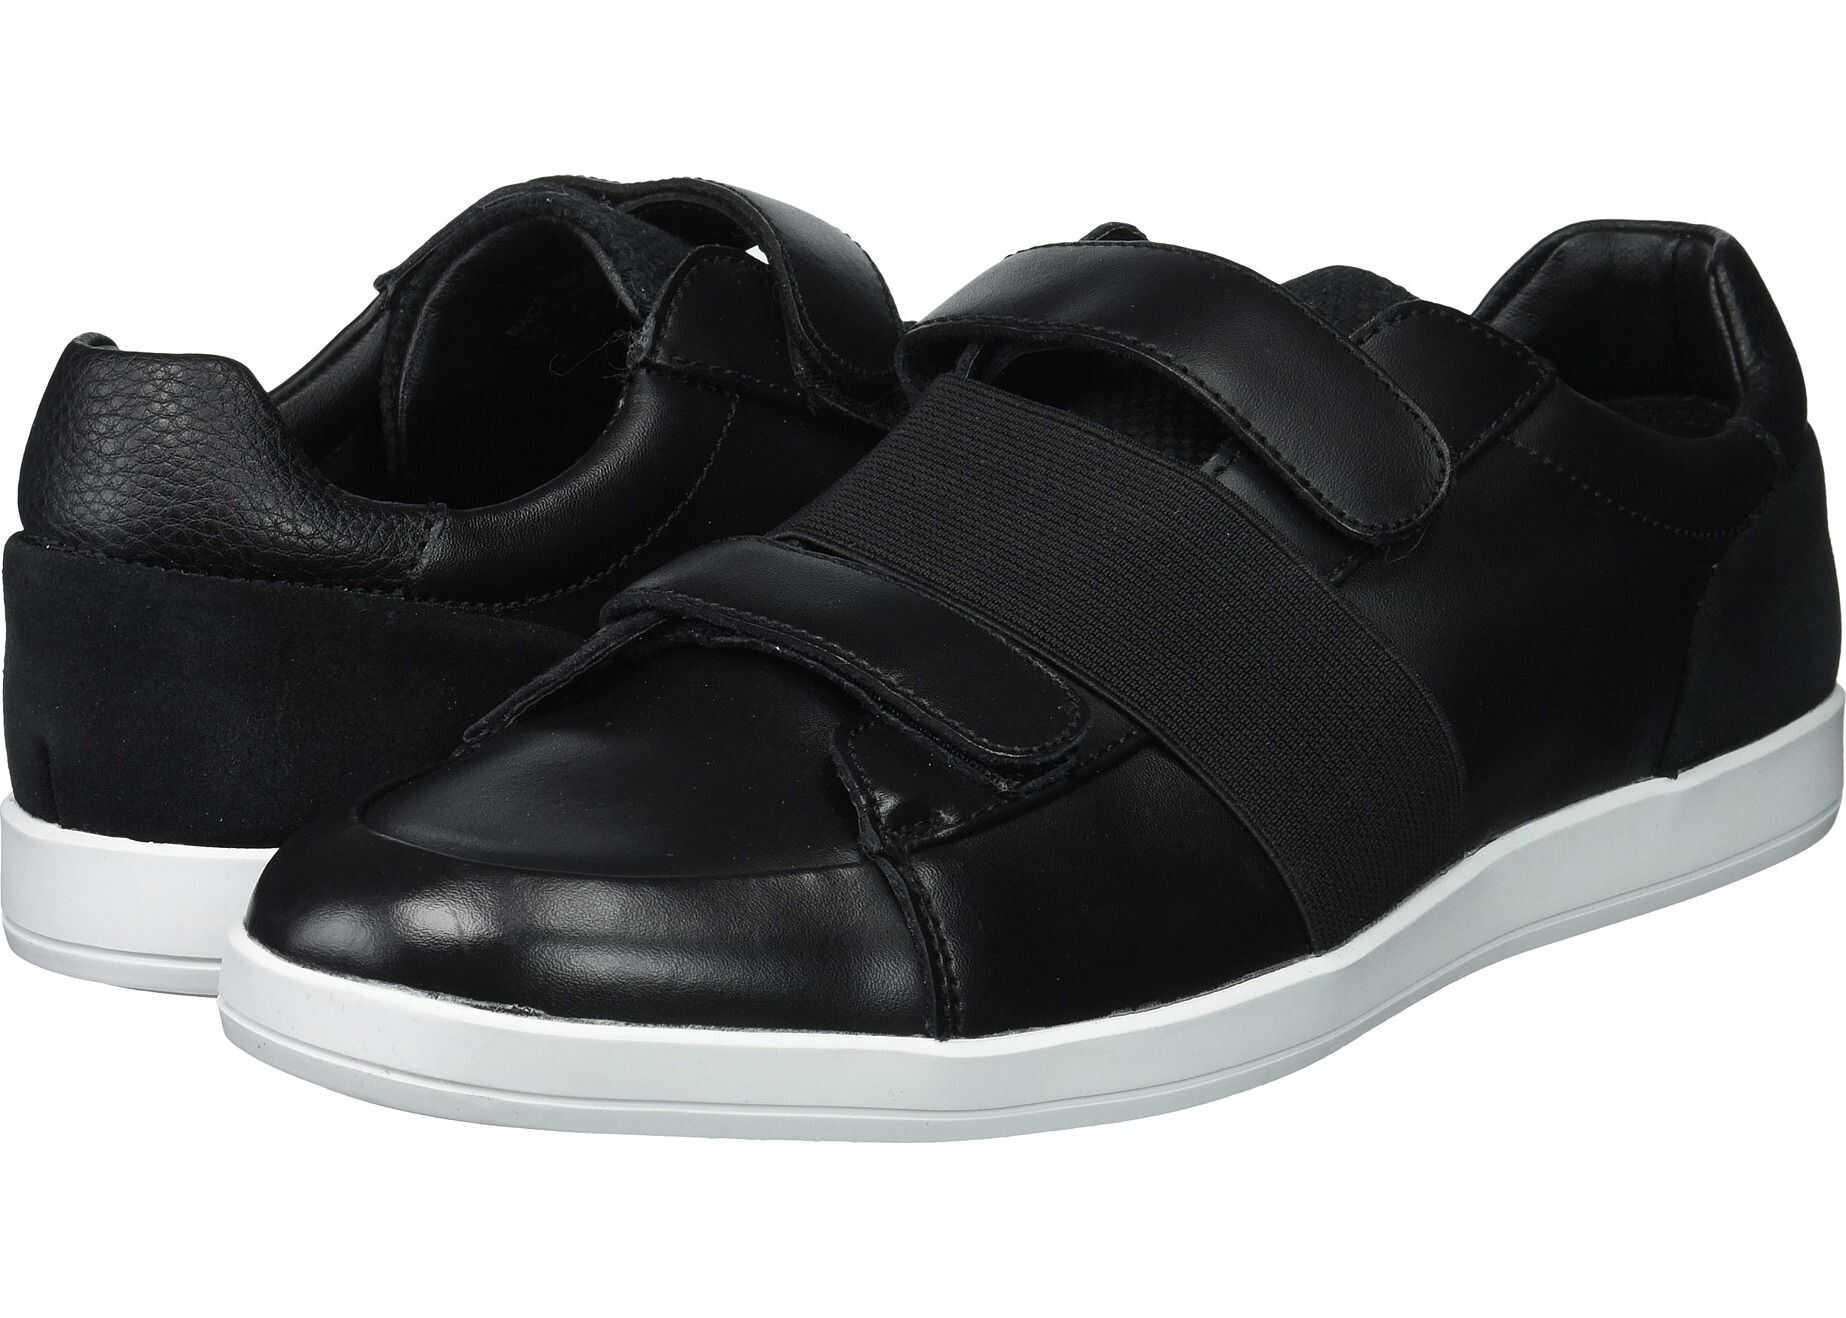 Calvin Klein Mace Black Brushed Leather